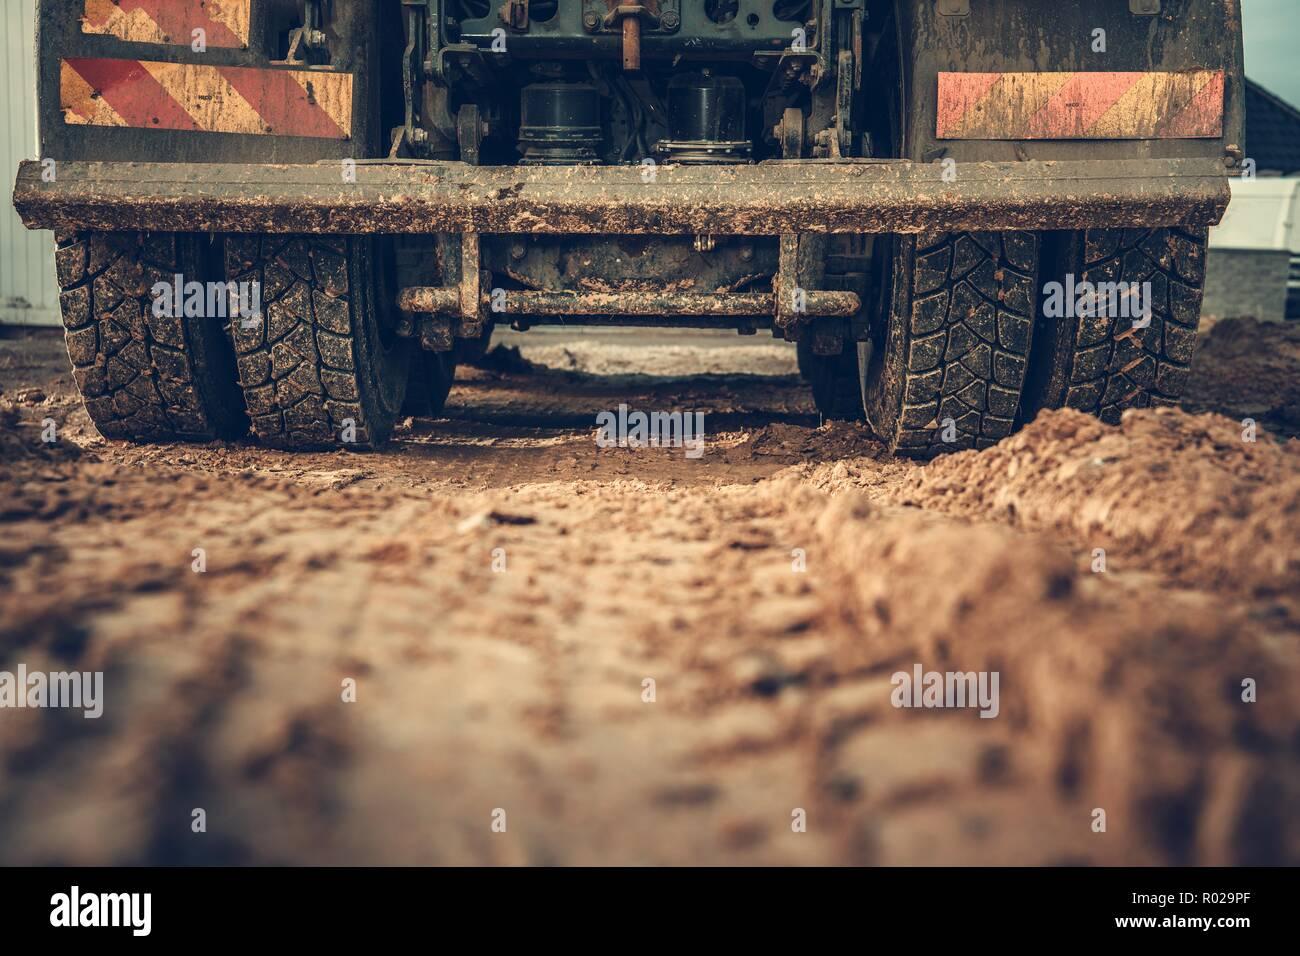 Dump Truck Ground Works Closeup Photo. Heavy Duty Vehicle Rear Wheels Closeup. Construction Site. - Stock Image